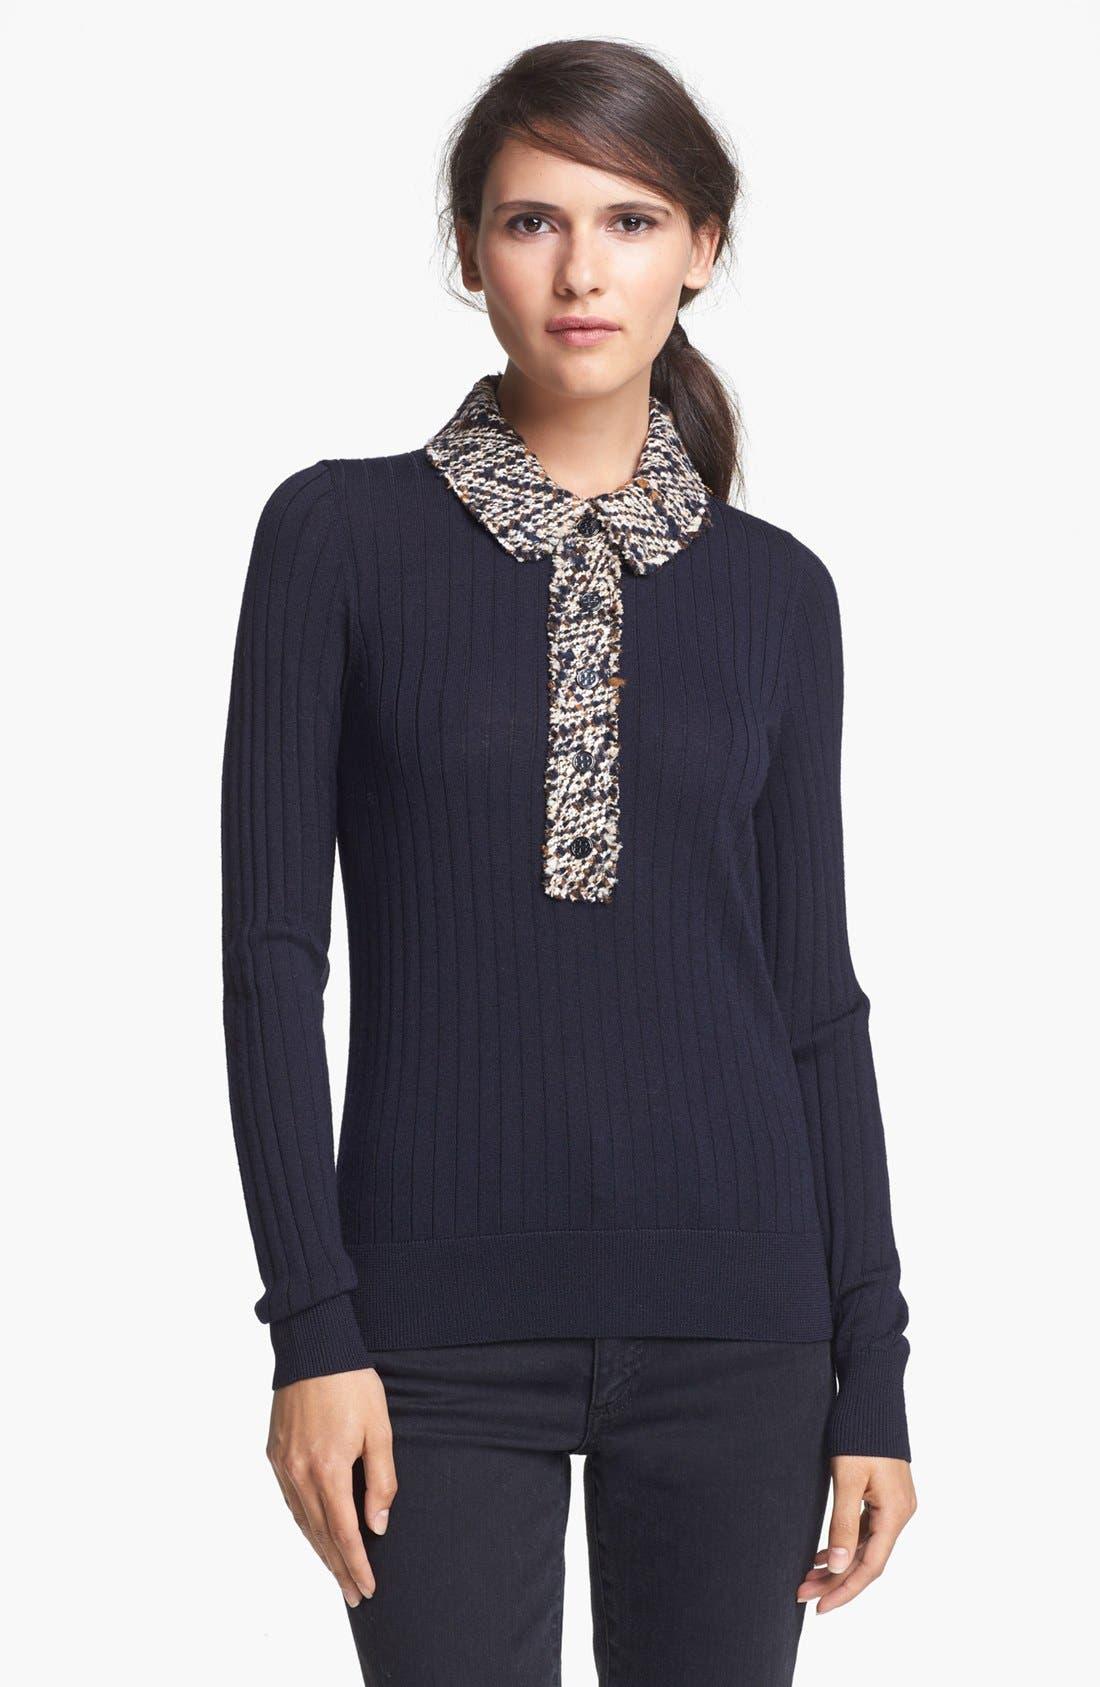 Alternate Image 1 Selected - Tory Burch 'Zelda' Merino Wool Sweater